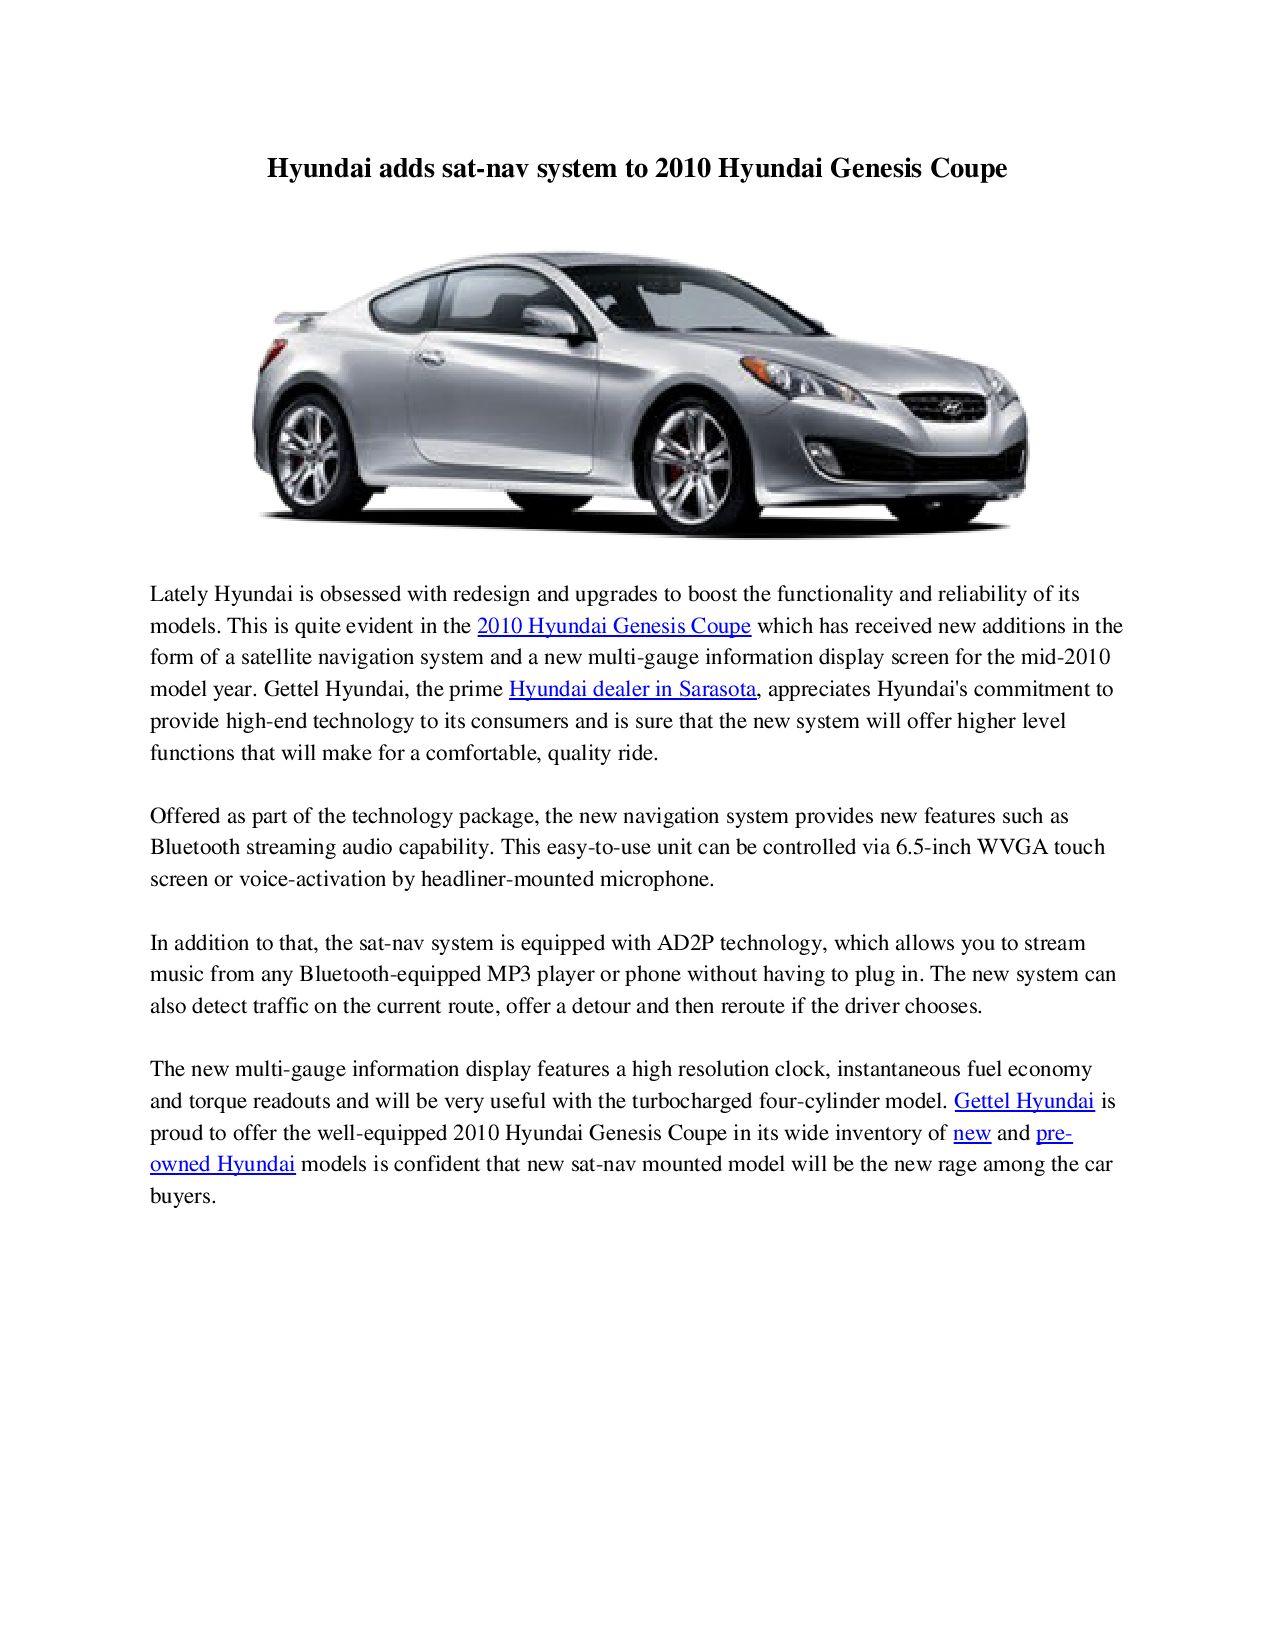 Gettel Hyundai Sarasota >> Sarasota Hyundai Dealer Hyundai Adds Sat Nav System To 2010